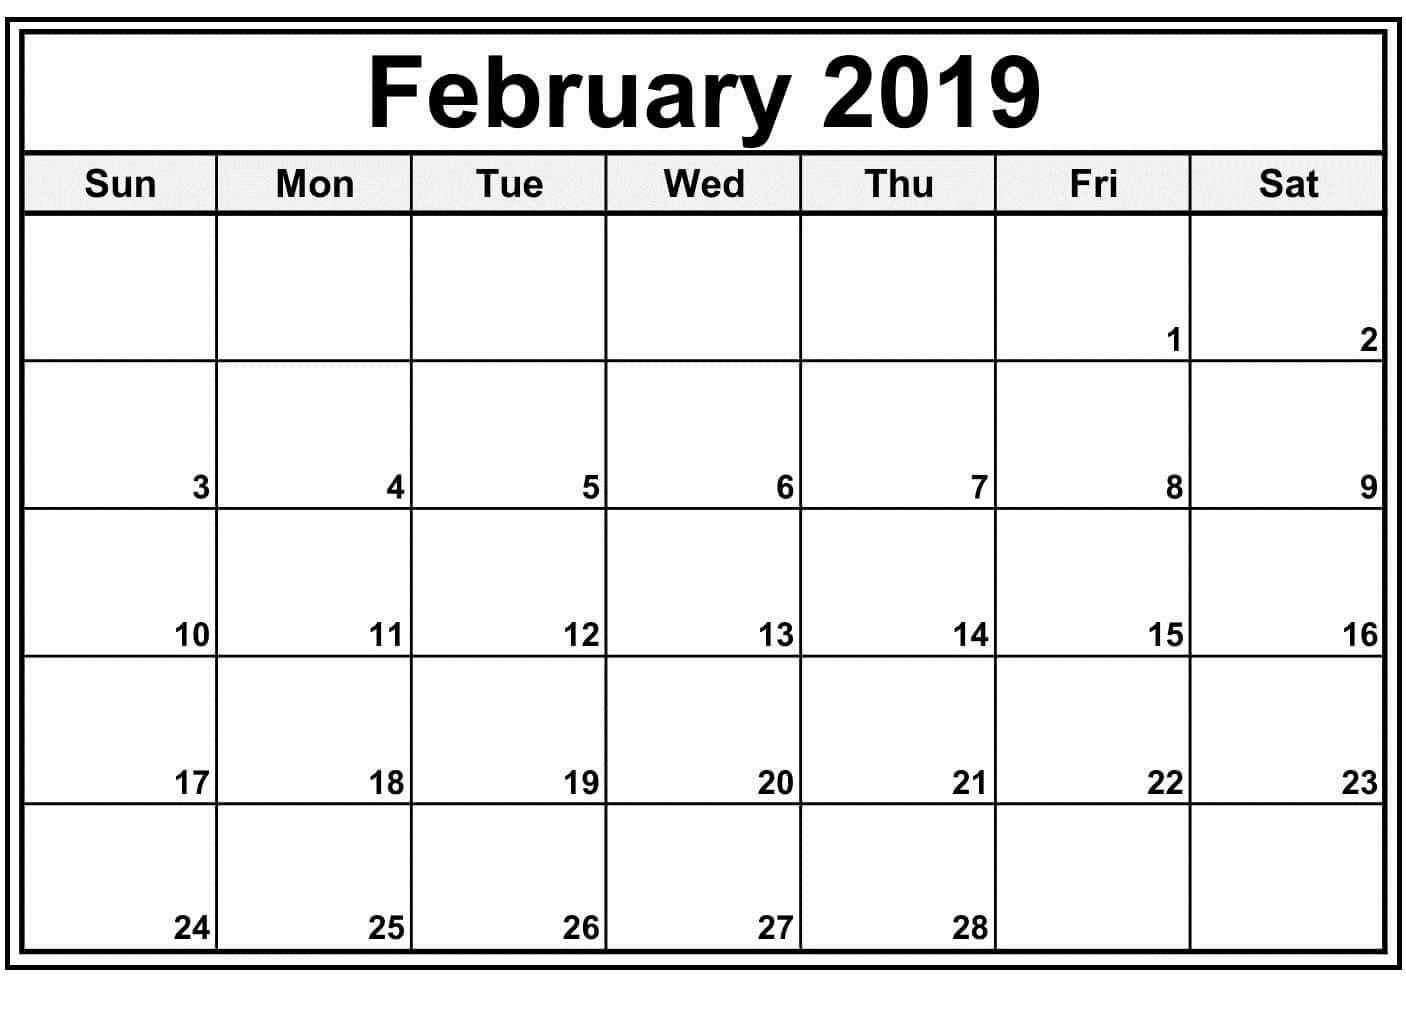 February 2019 Blank Calendar Template Blank Calendar Template